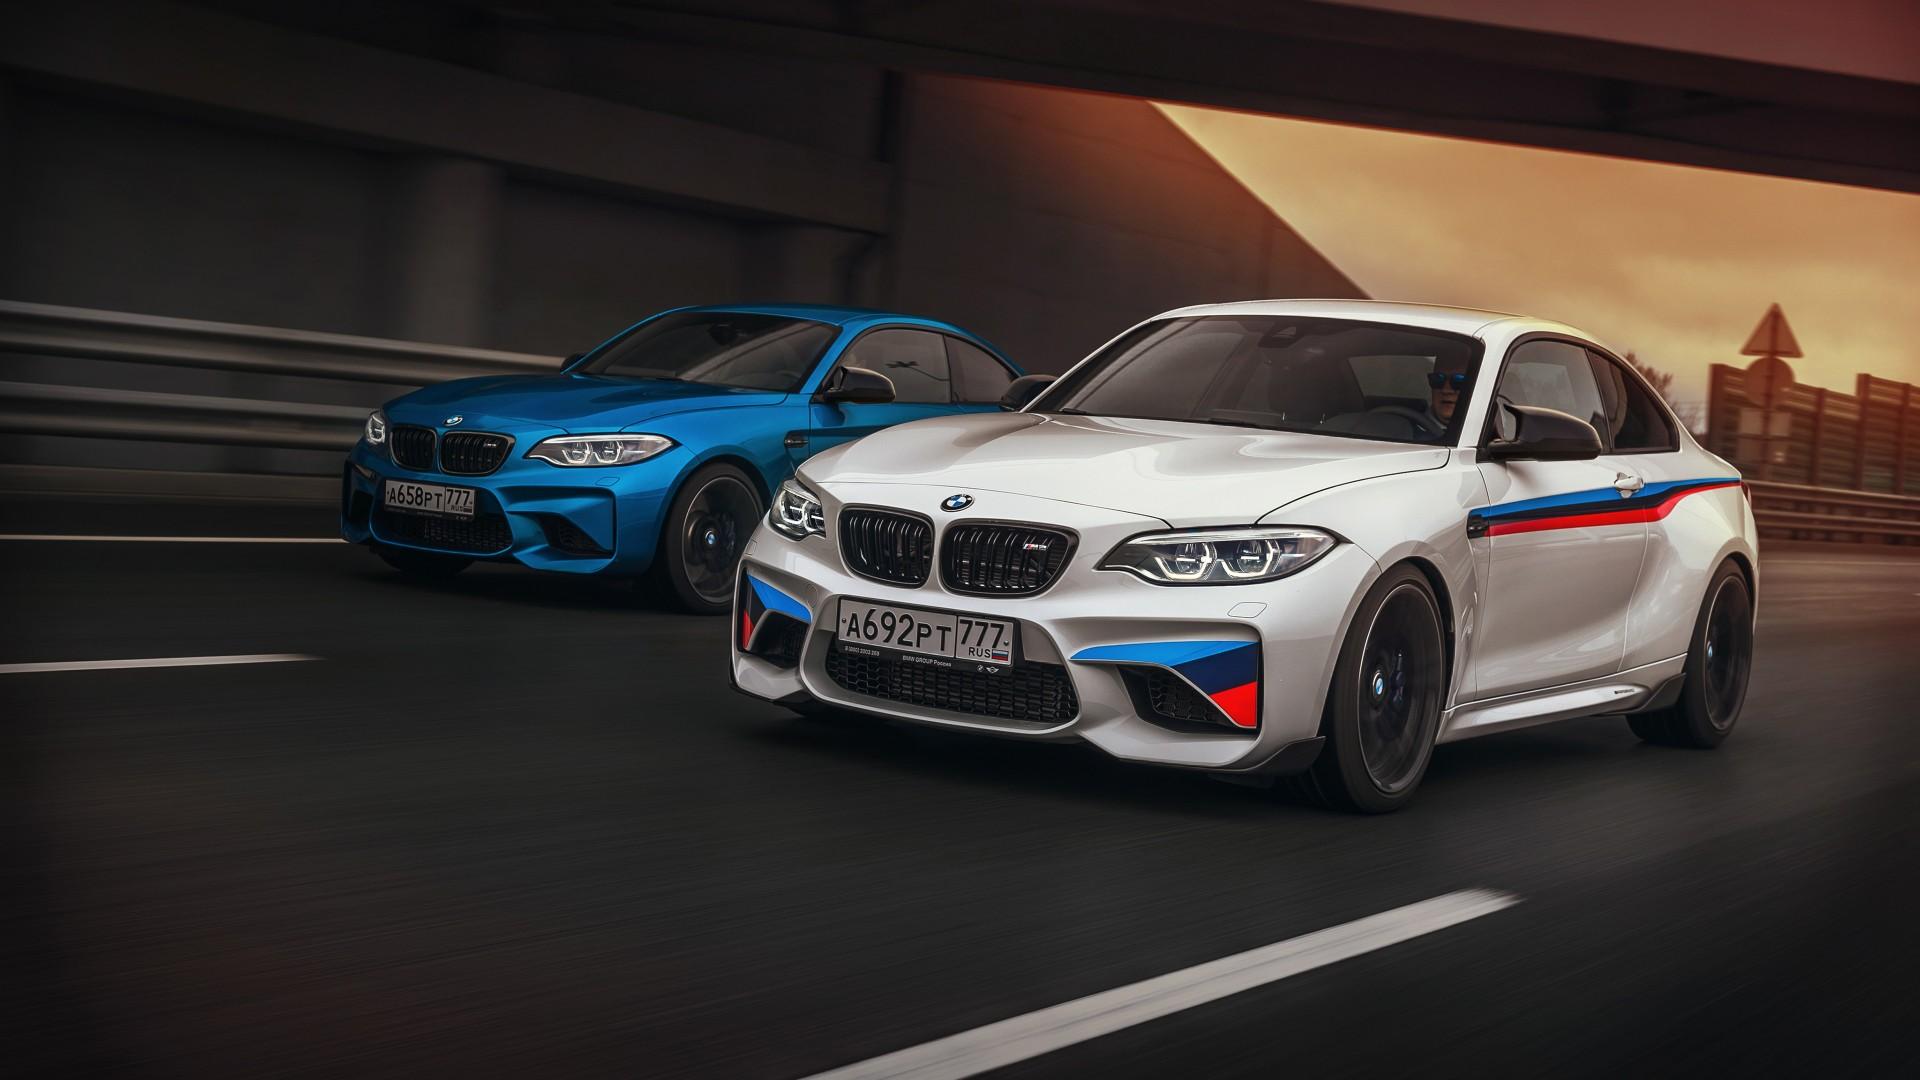 BMW Z4 Roadster >> 2018 BMW M2 4K Wallpaper | HD Car Wallpapers | ID #8106